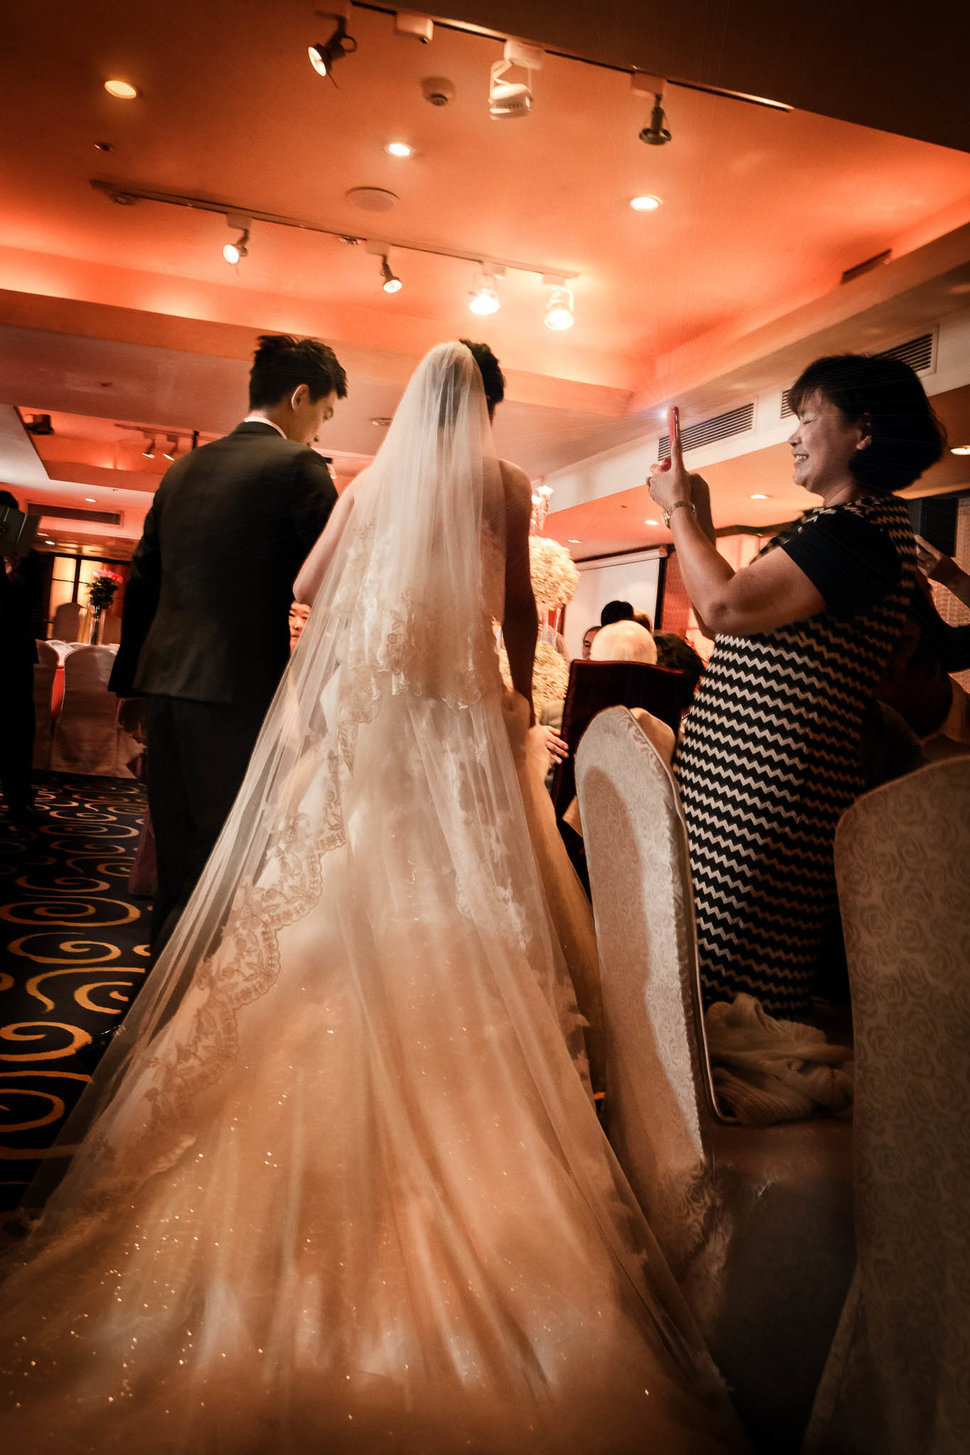 18PHOTO-元善❤️ 傳瑀(編號:308847) - 18PHOTO 婚紗影像攝影工作室 - 結婚吧